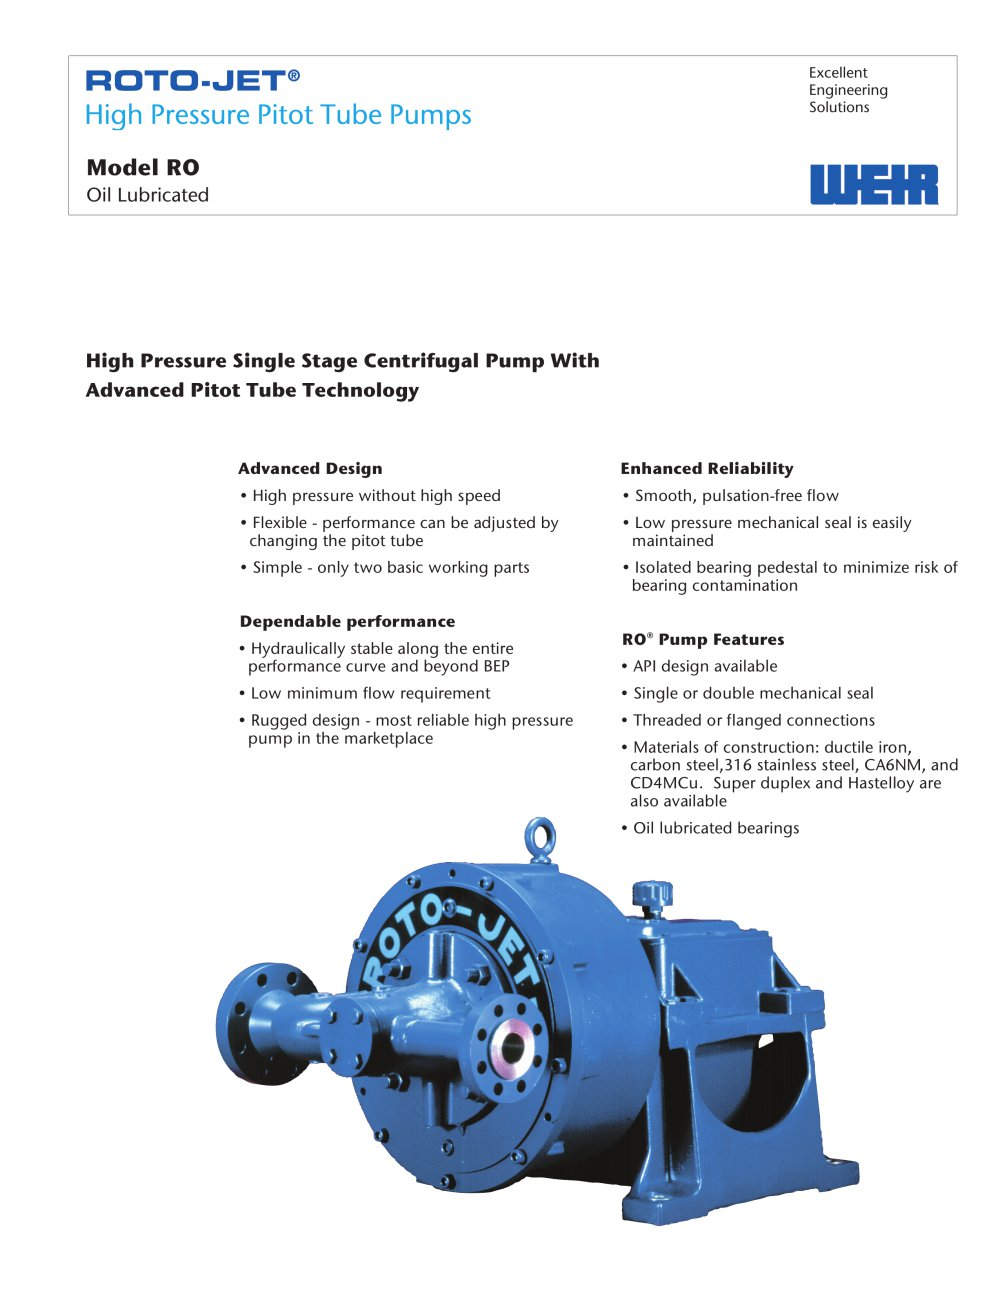 roto jet model ro weir power industrial pdf catalogue rh pdf directindustry com Roto-Jet RG Pump Manuel Weir Roto Jet Pump